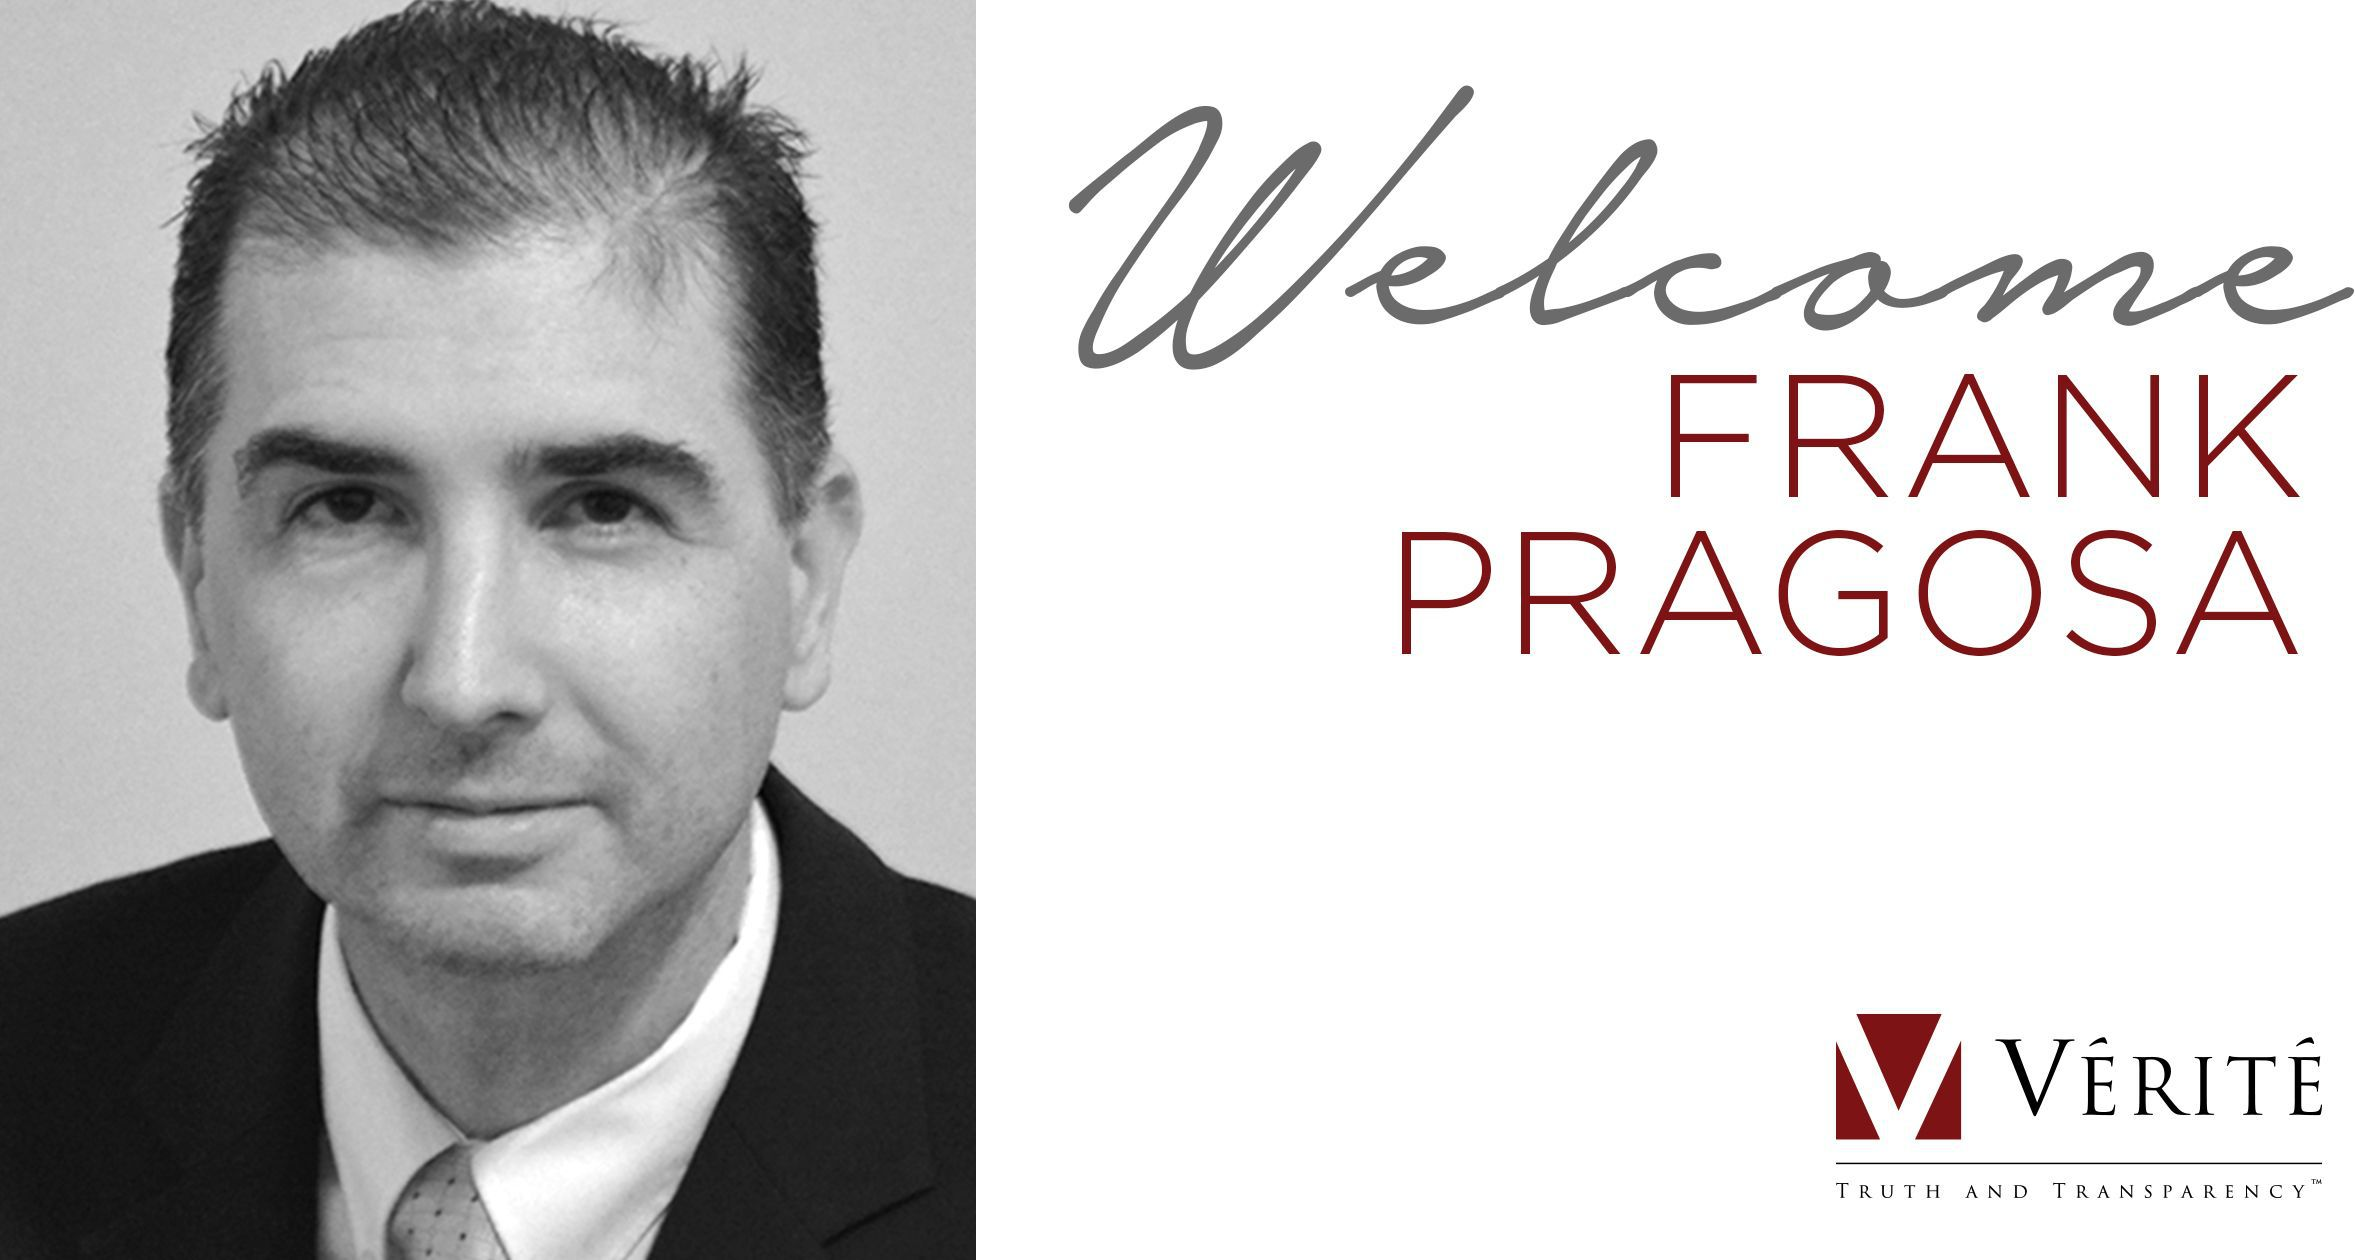 Vérité Welcomes Frank Pragosa